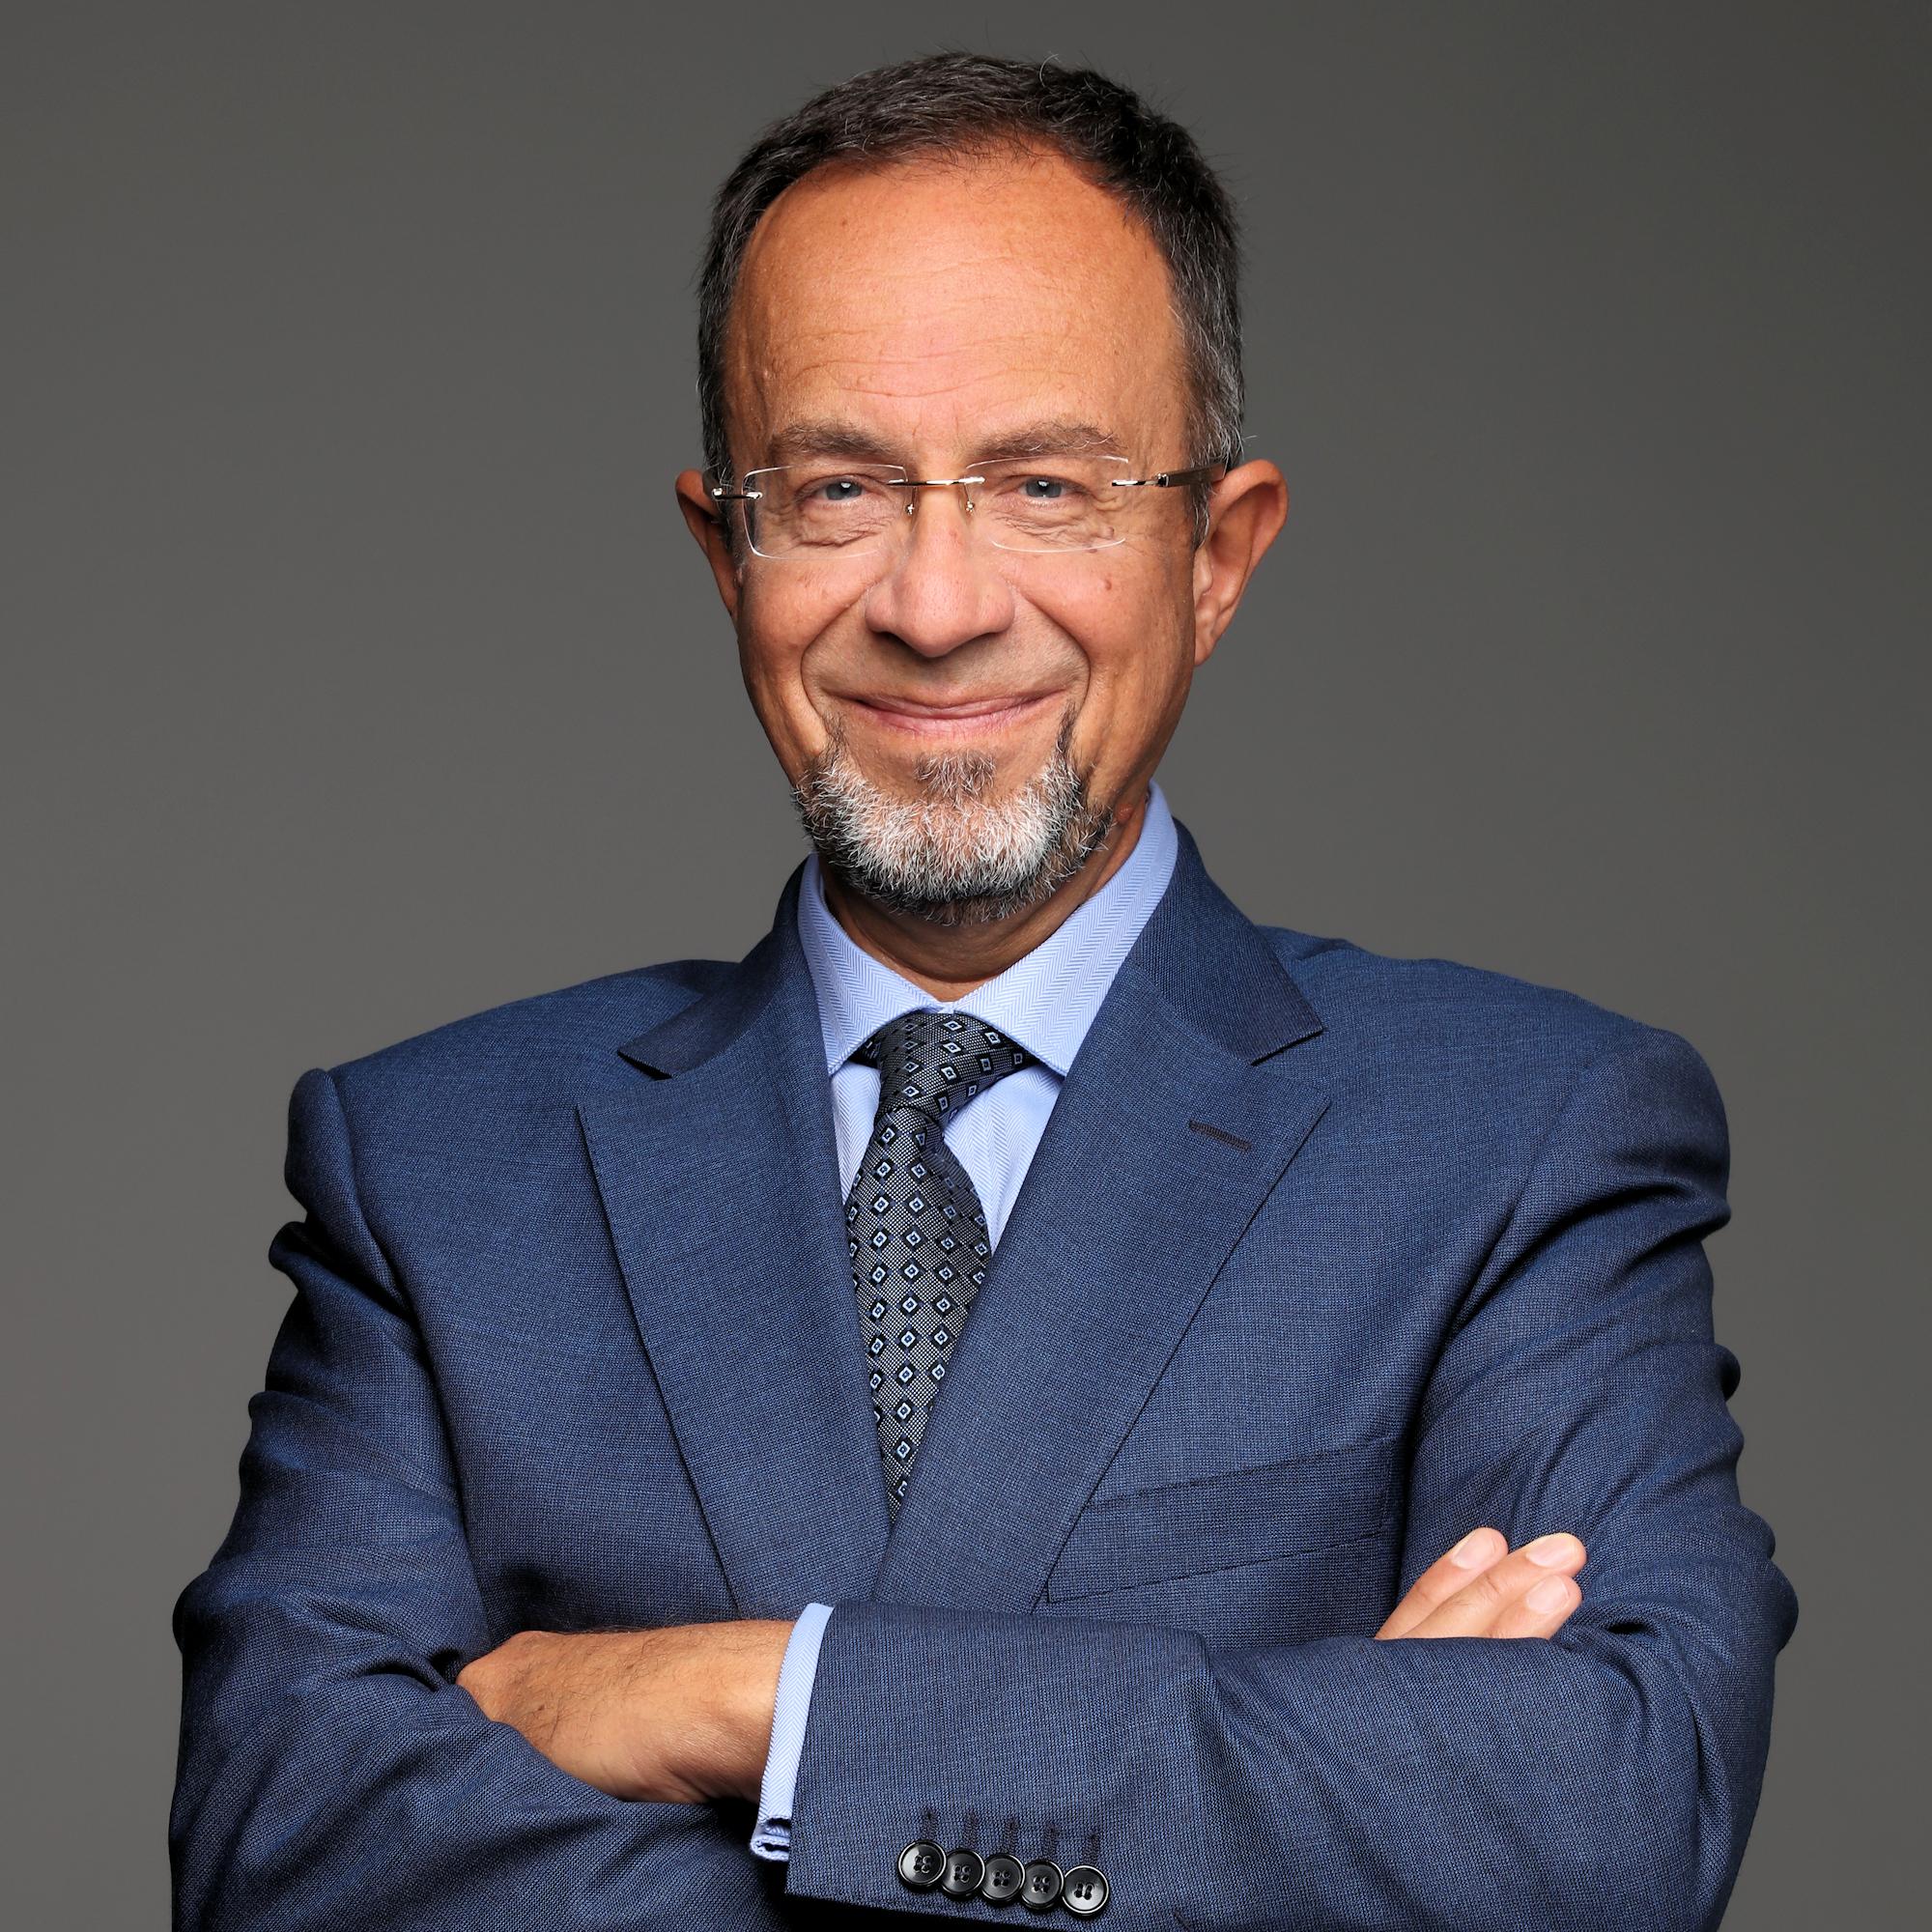 Dimitri F. Dimitriou